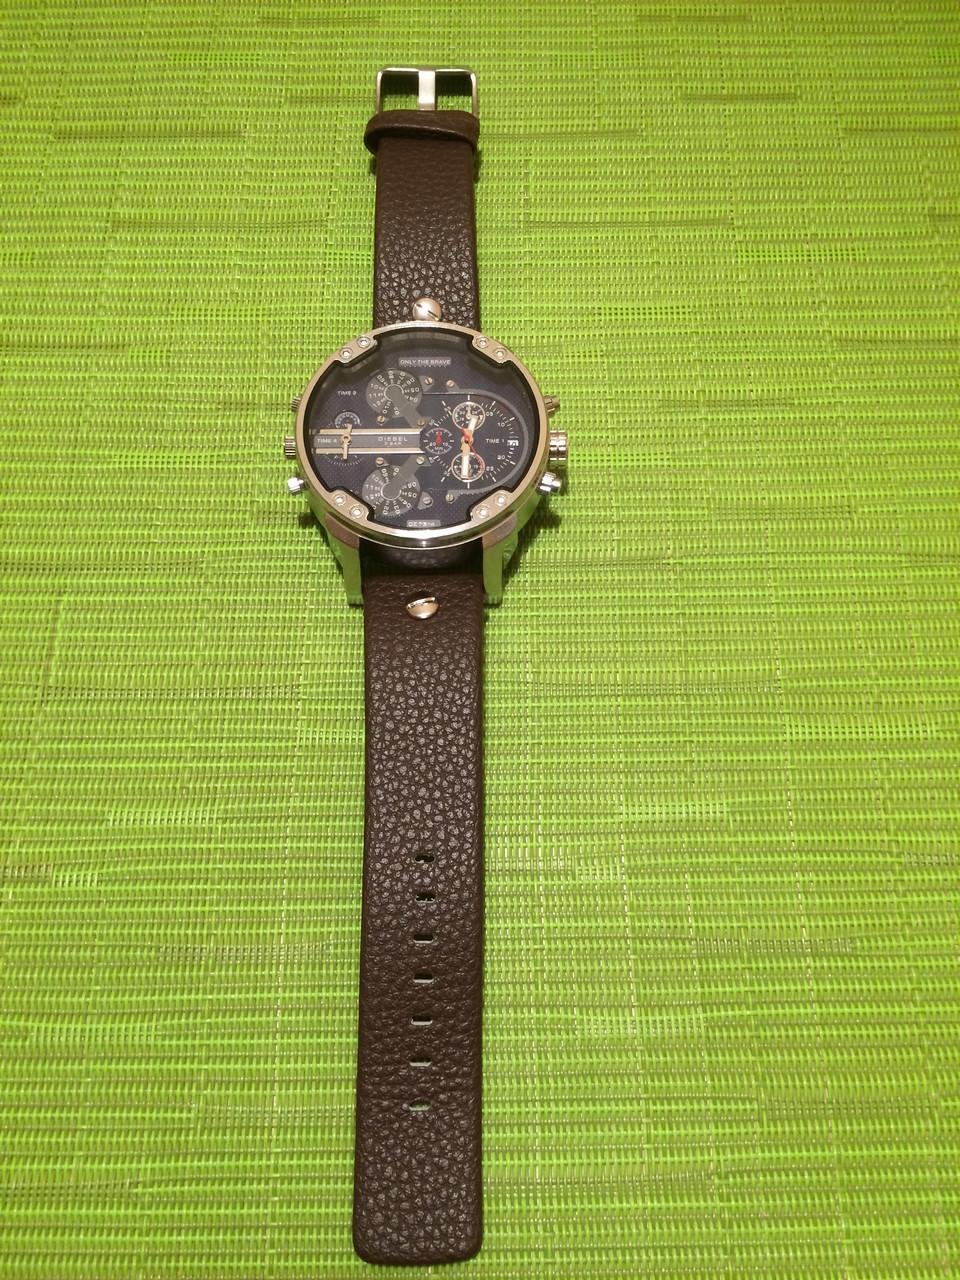 58e7cfab Мужские часы Diesel Brave DZ7314, качественная реплика (арт002) -